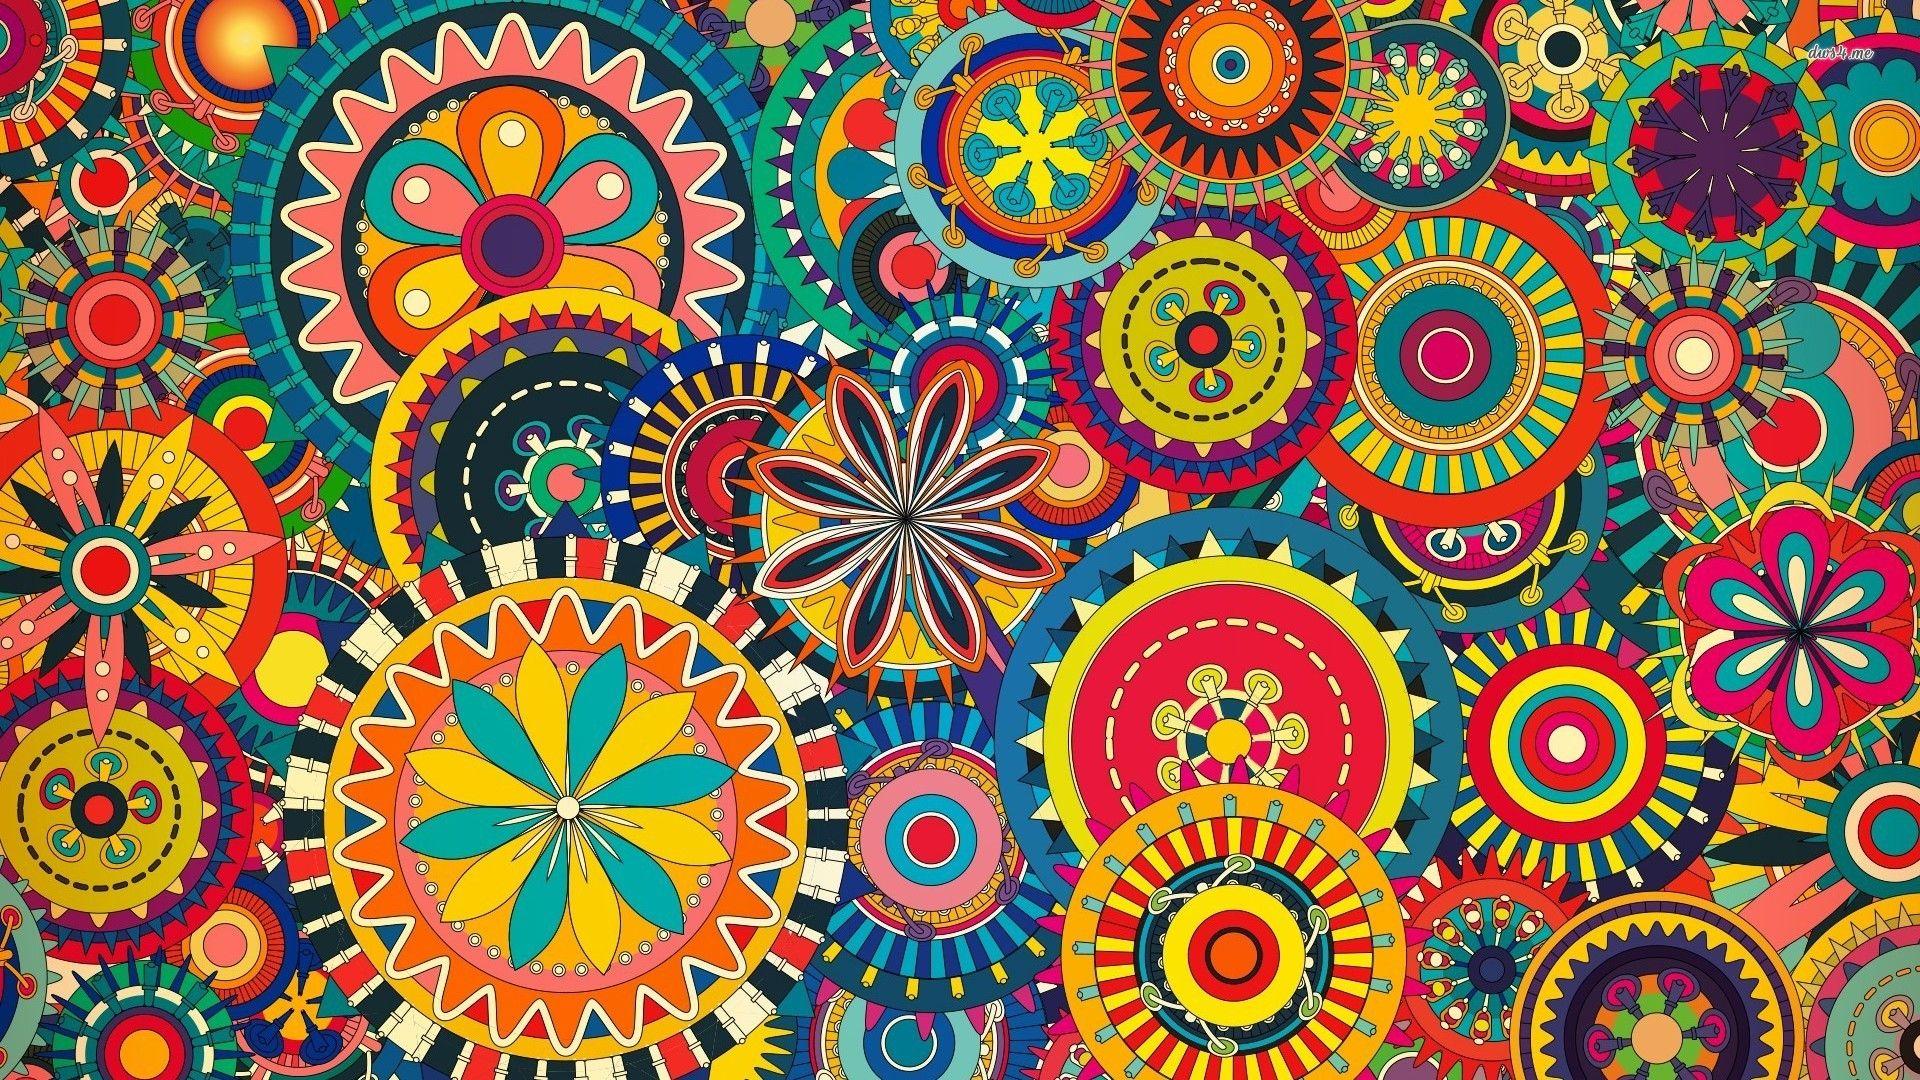 aztec pattern hd wallpaper - photo #14